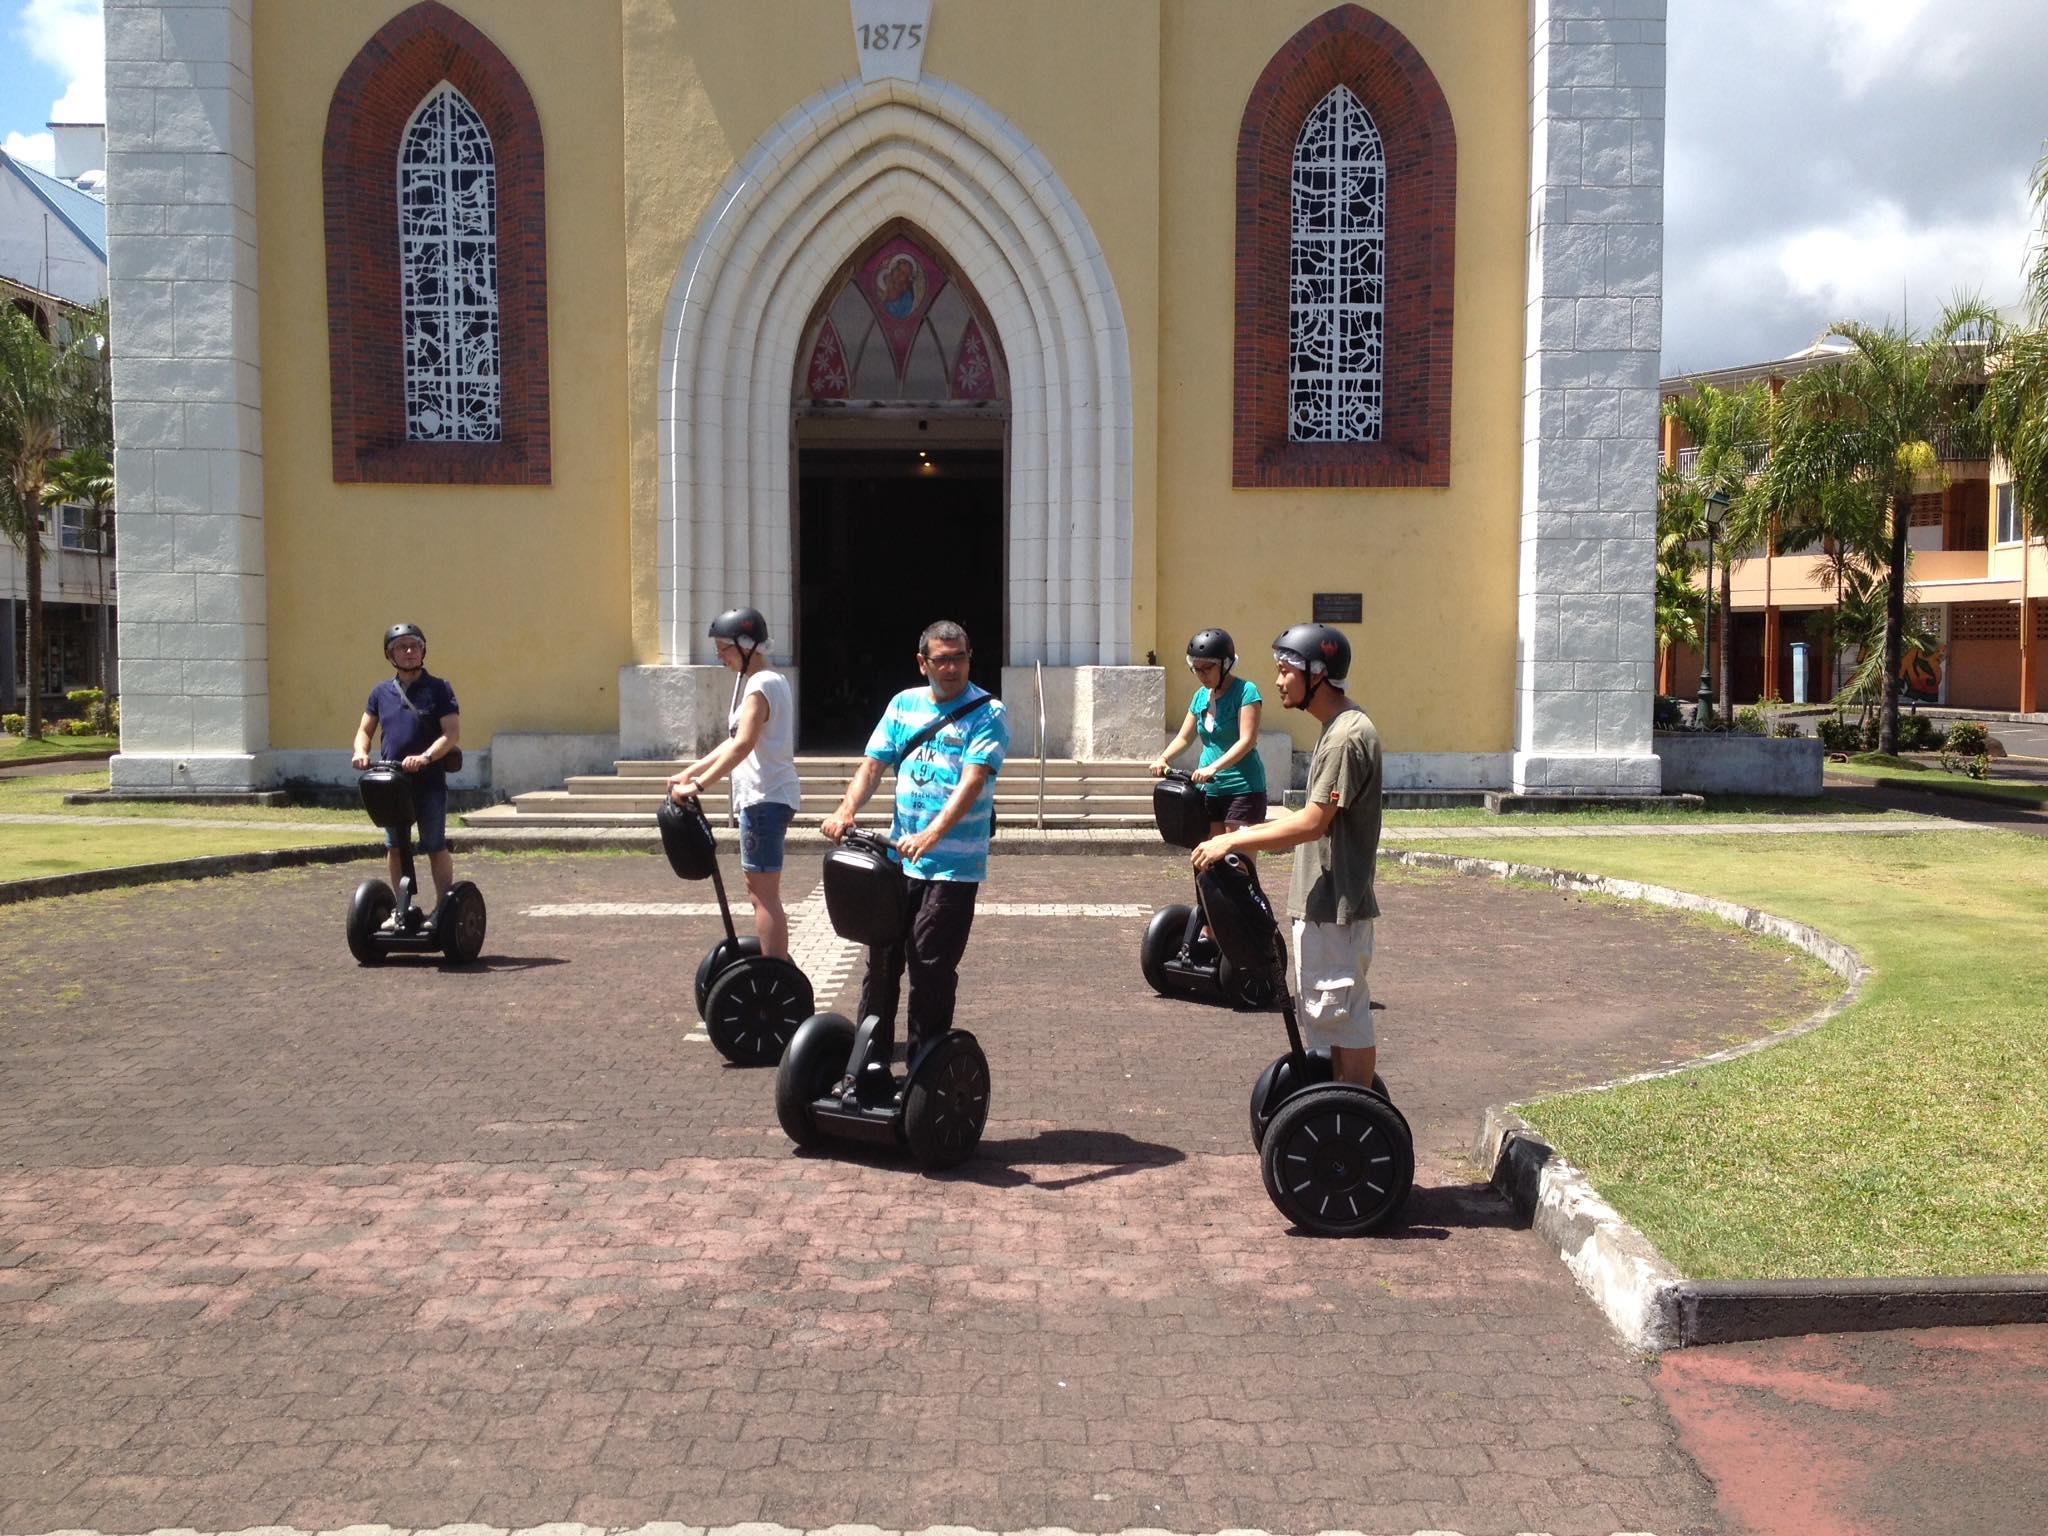 La cathédrale de Papeete en Segway à Tahiti